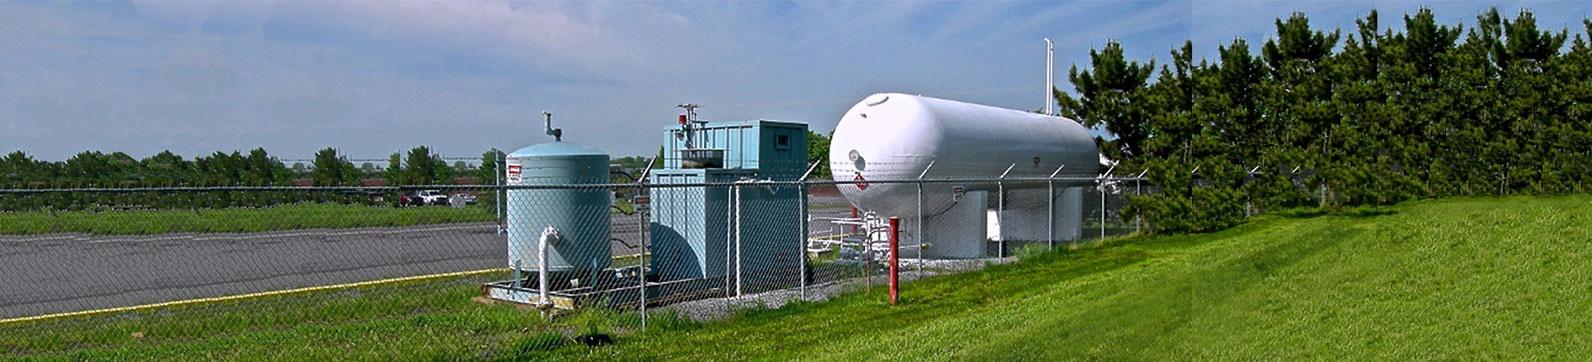 LPG Propane Butane Base Load Systems - Design Engineering Fabrication Construction.jpg